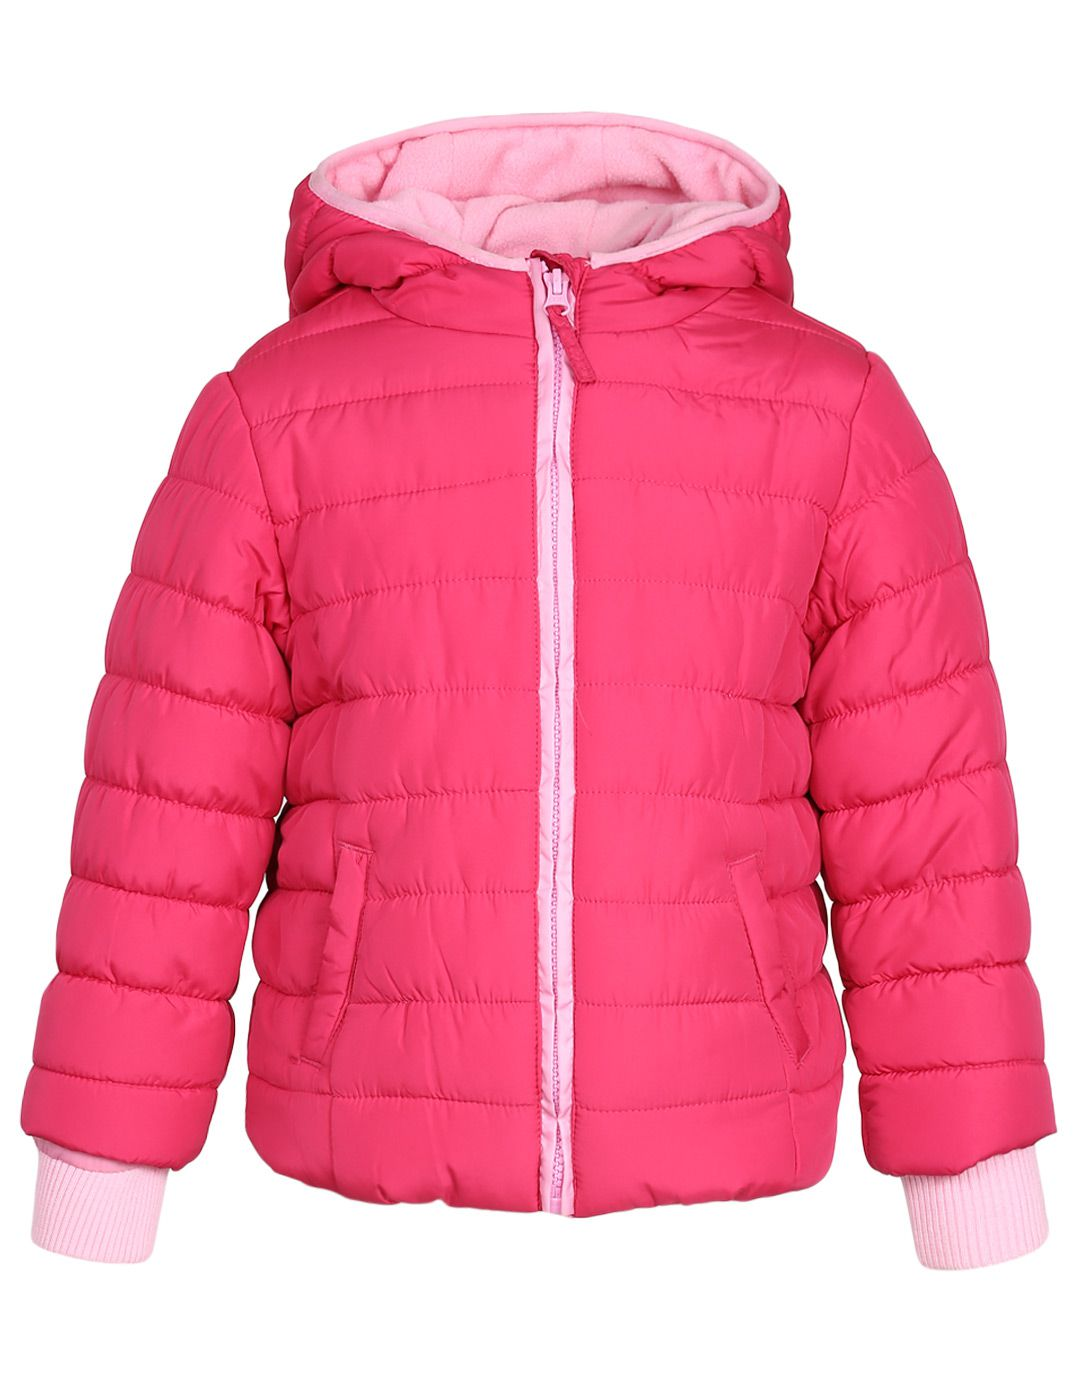 Mothercare Girls Pink Sweatshirts